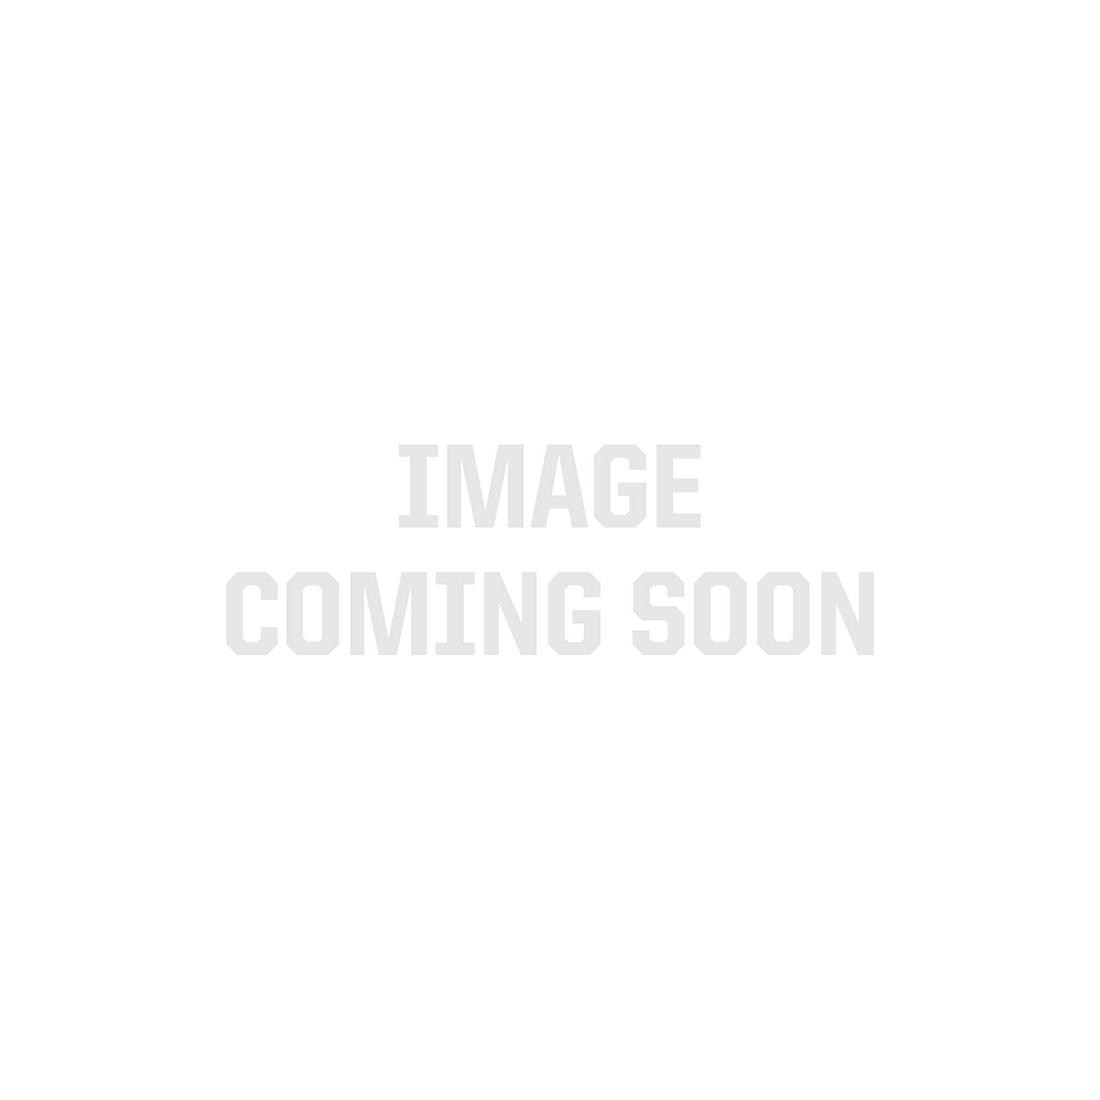 Madrix 5 Entry License ONLY (8x512 DMX, 128x128 DVI)